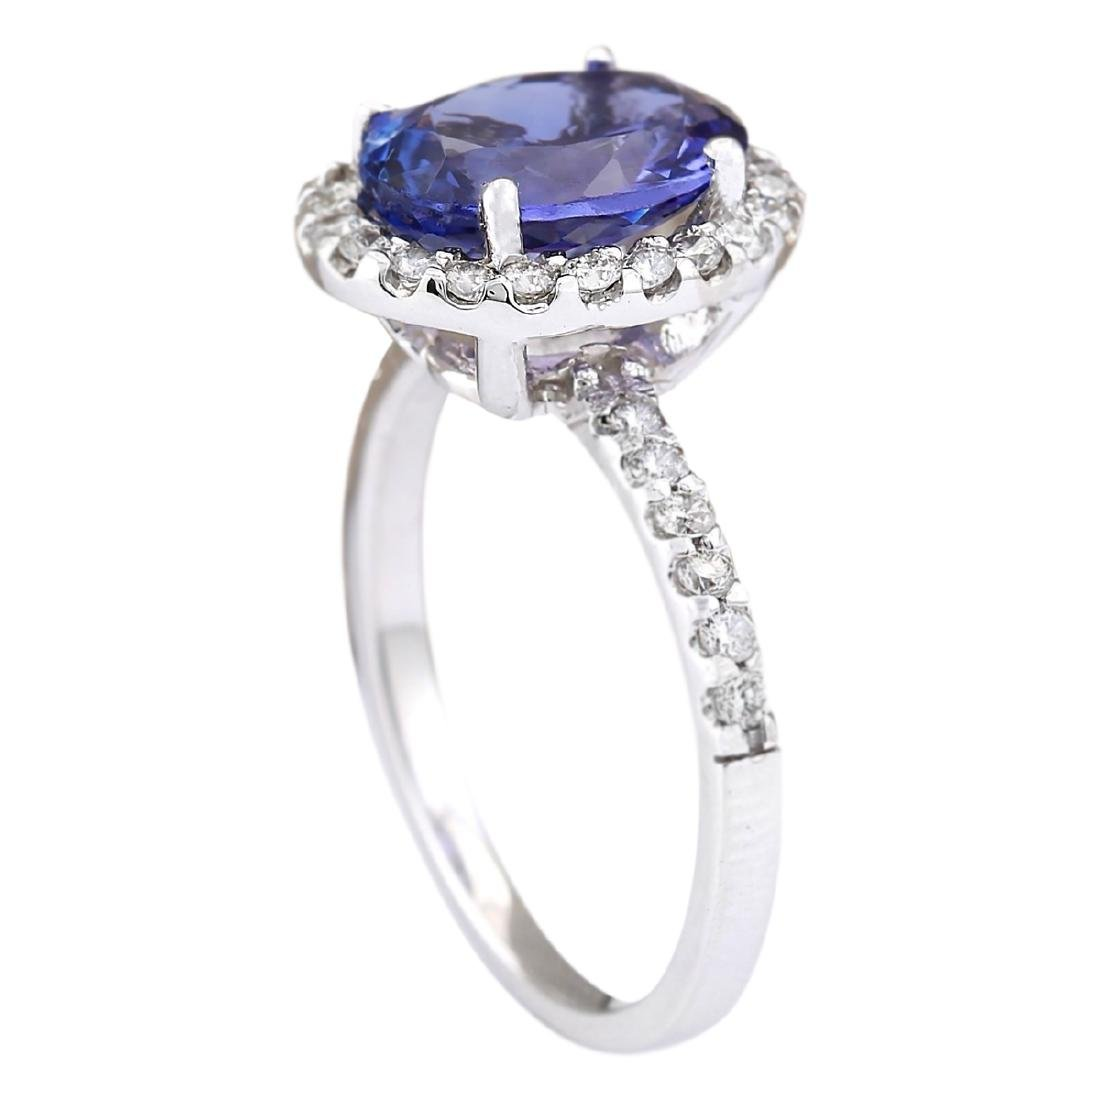 3.63 CTW Natural Blue Tanzanite And Diamond Ring 18K - 3